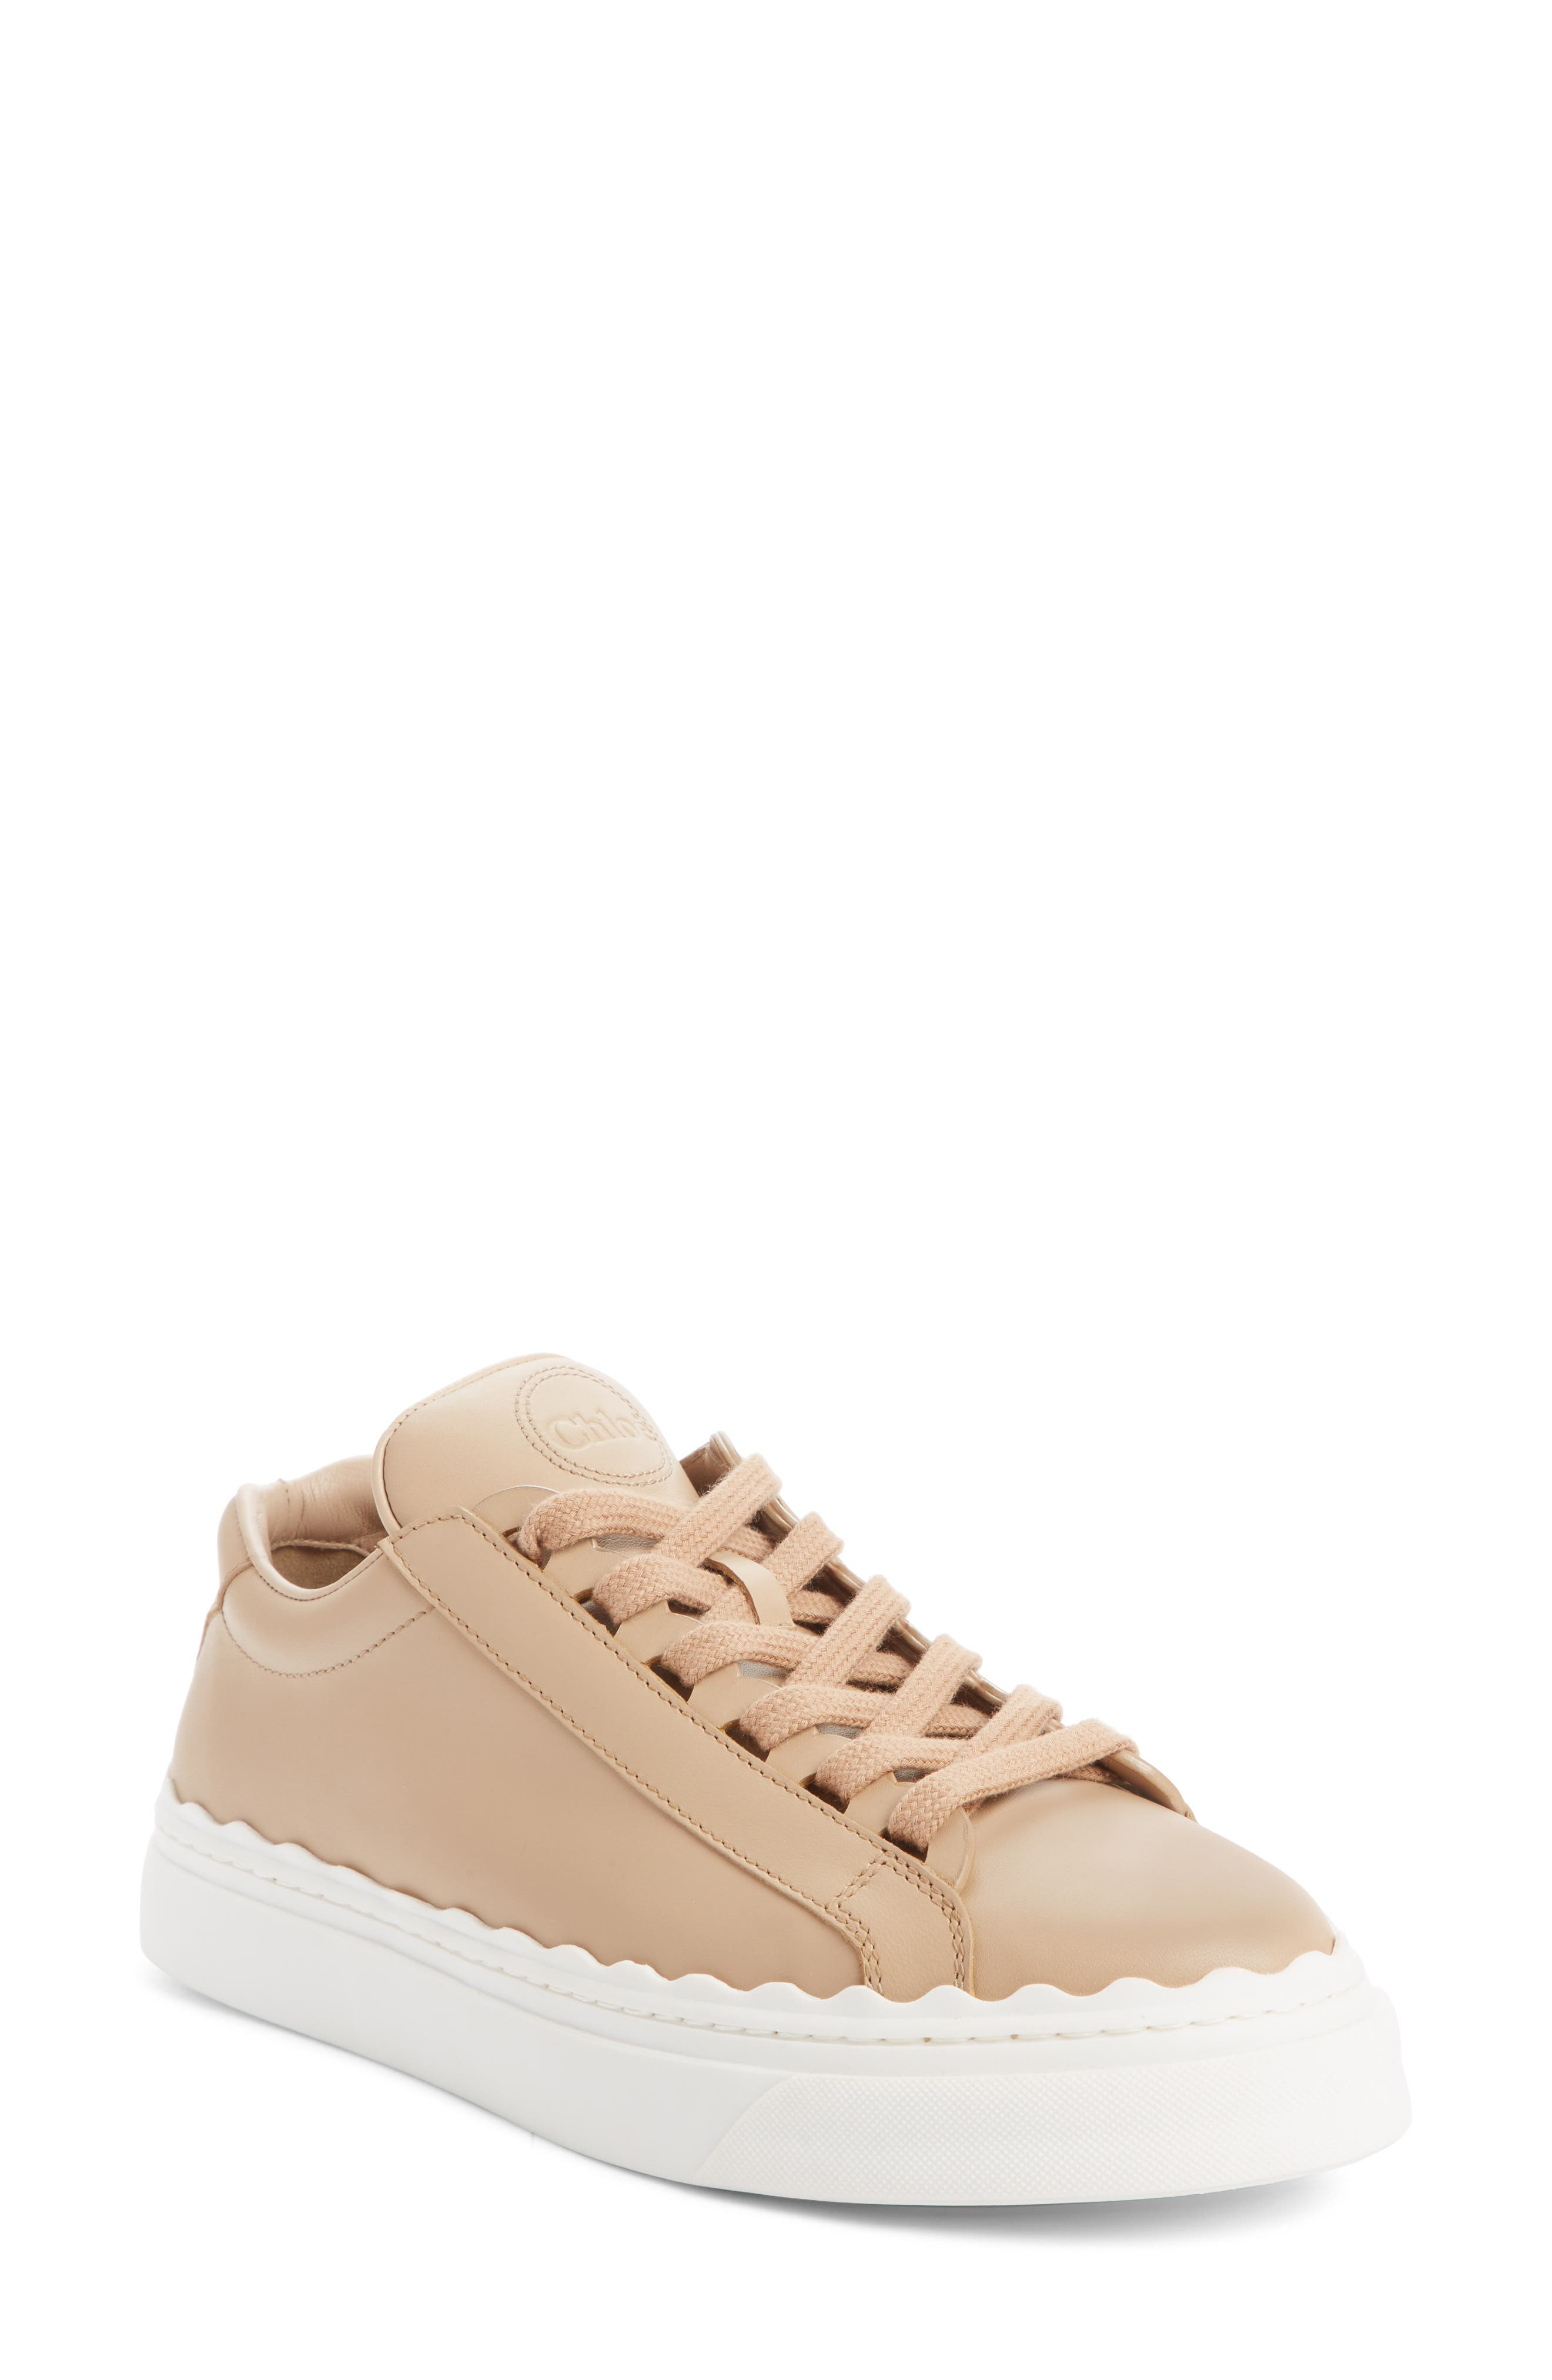 Chloe Lauren Sneaker, Brown